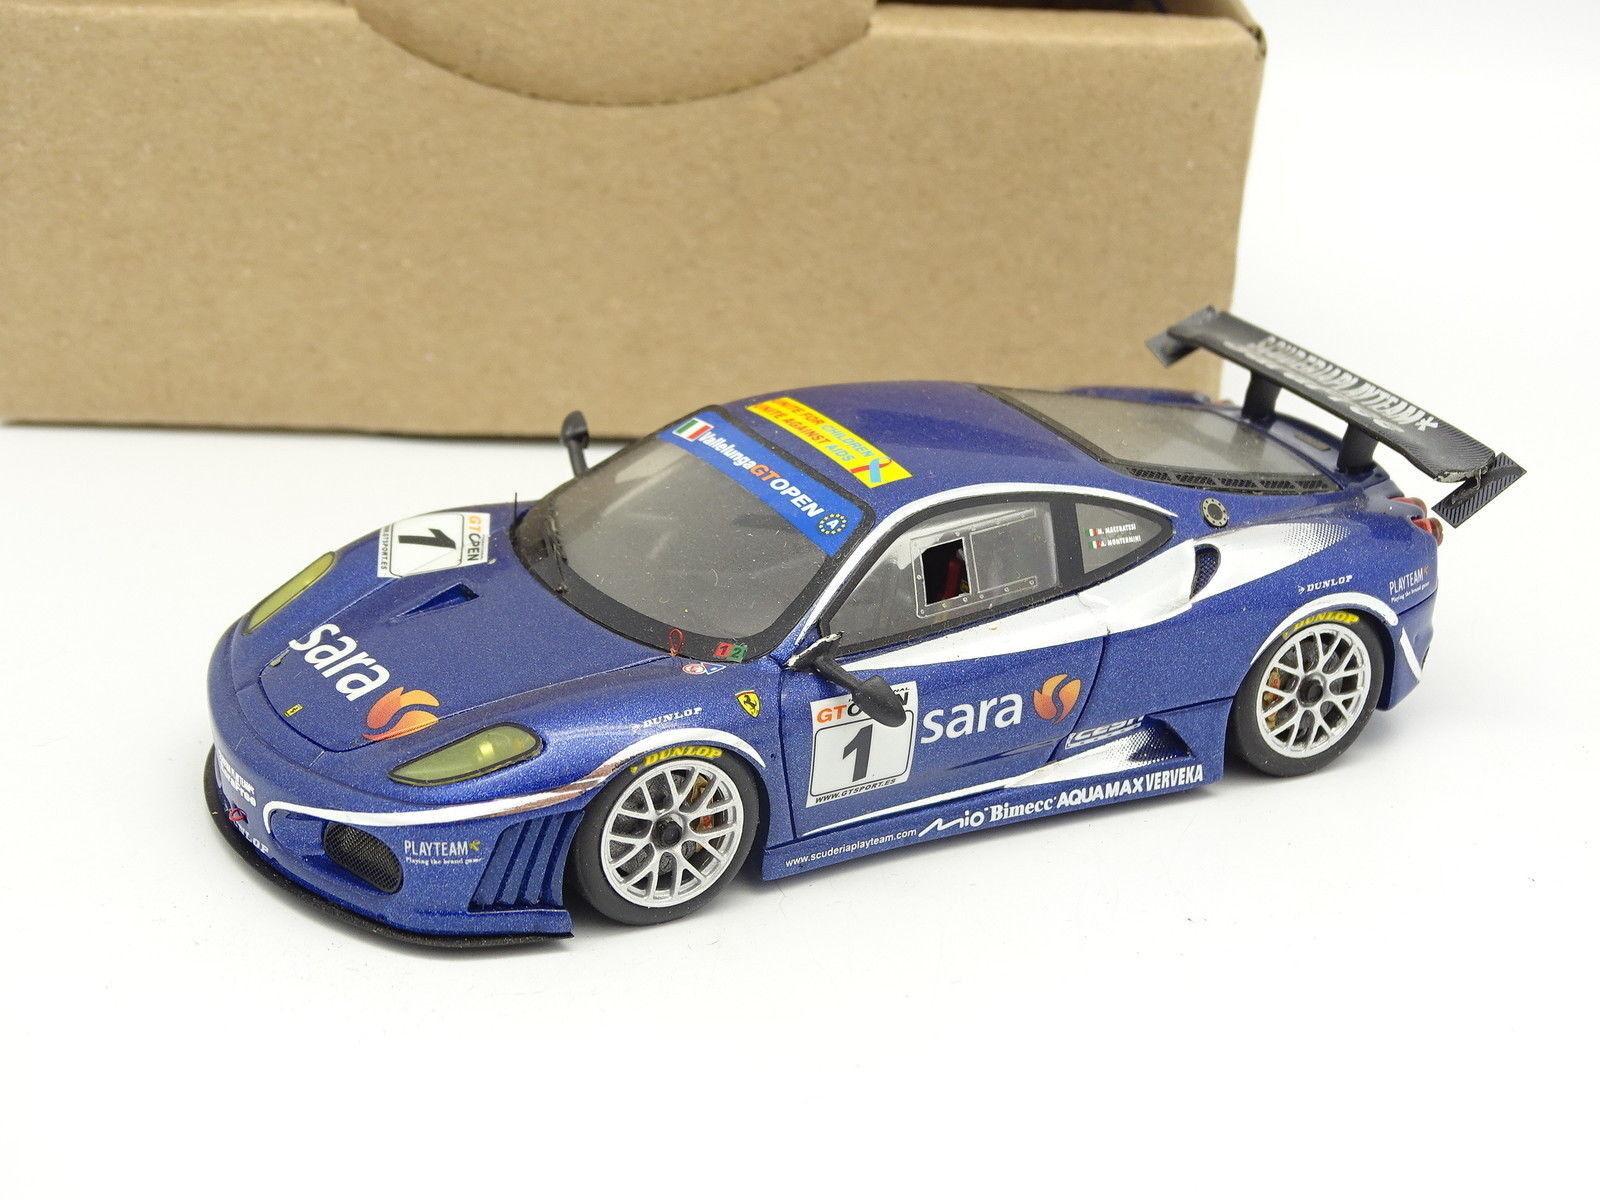 BBR Kit Monté Résine SB 1 43 - Ferrari F430 GT Open GT 2007 Playteam Car N1